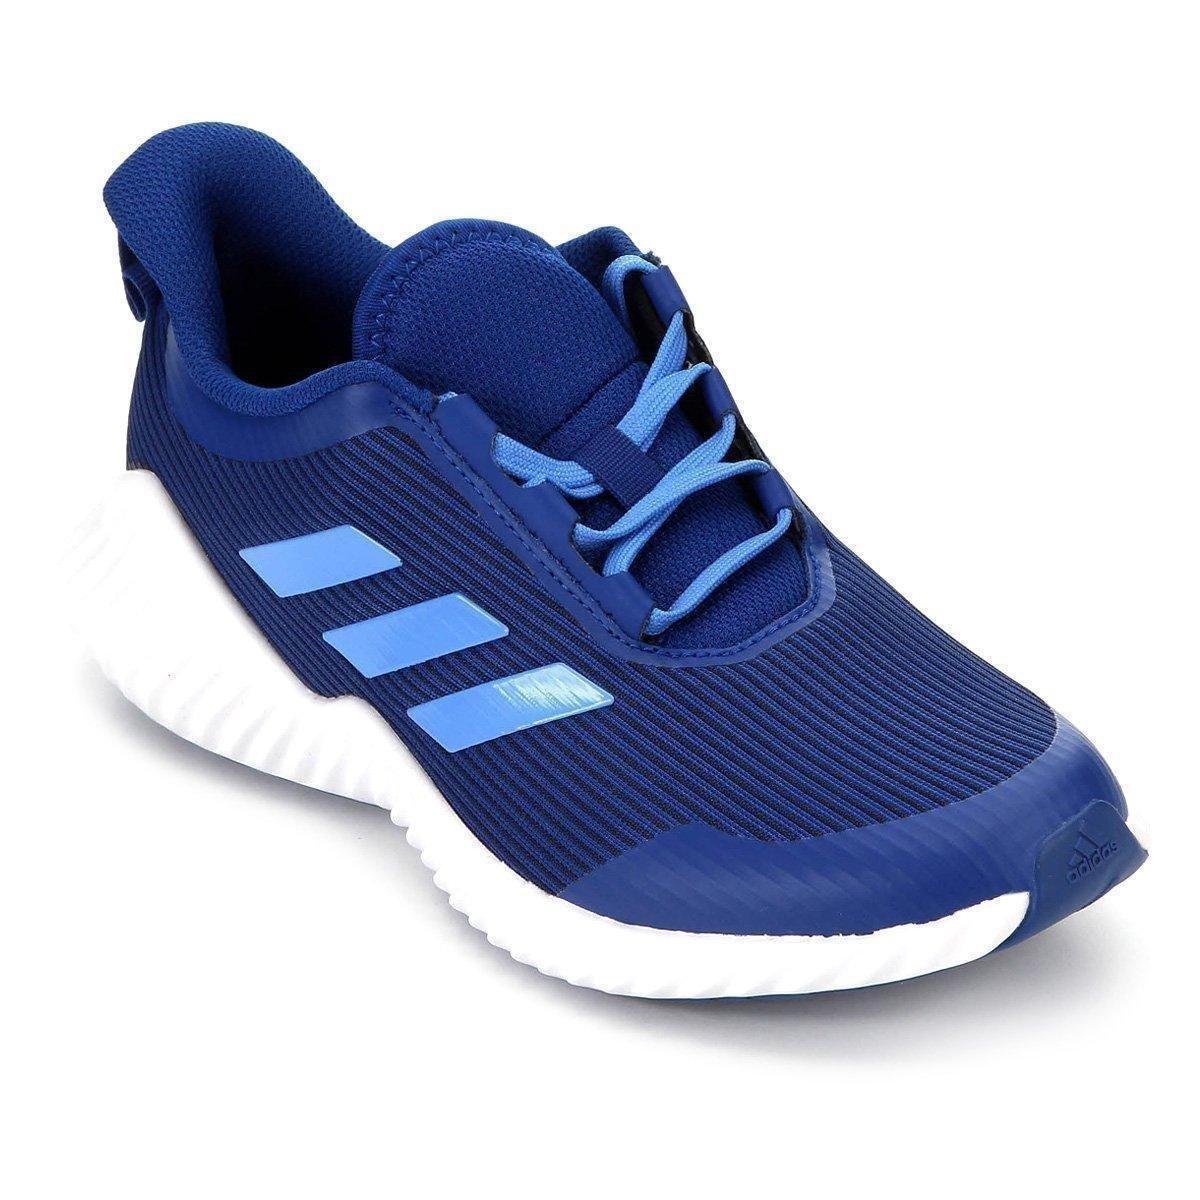 Tênis Adidas Fortarun K Infantil Azul Royal